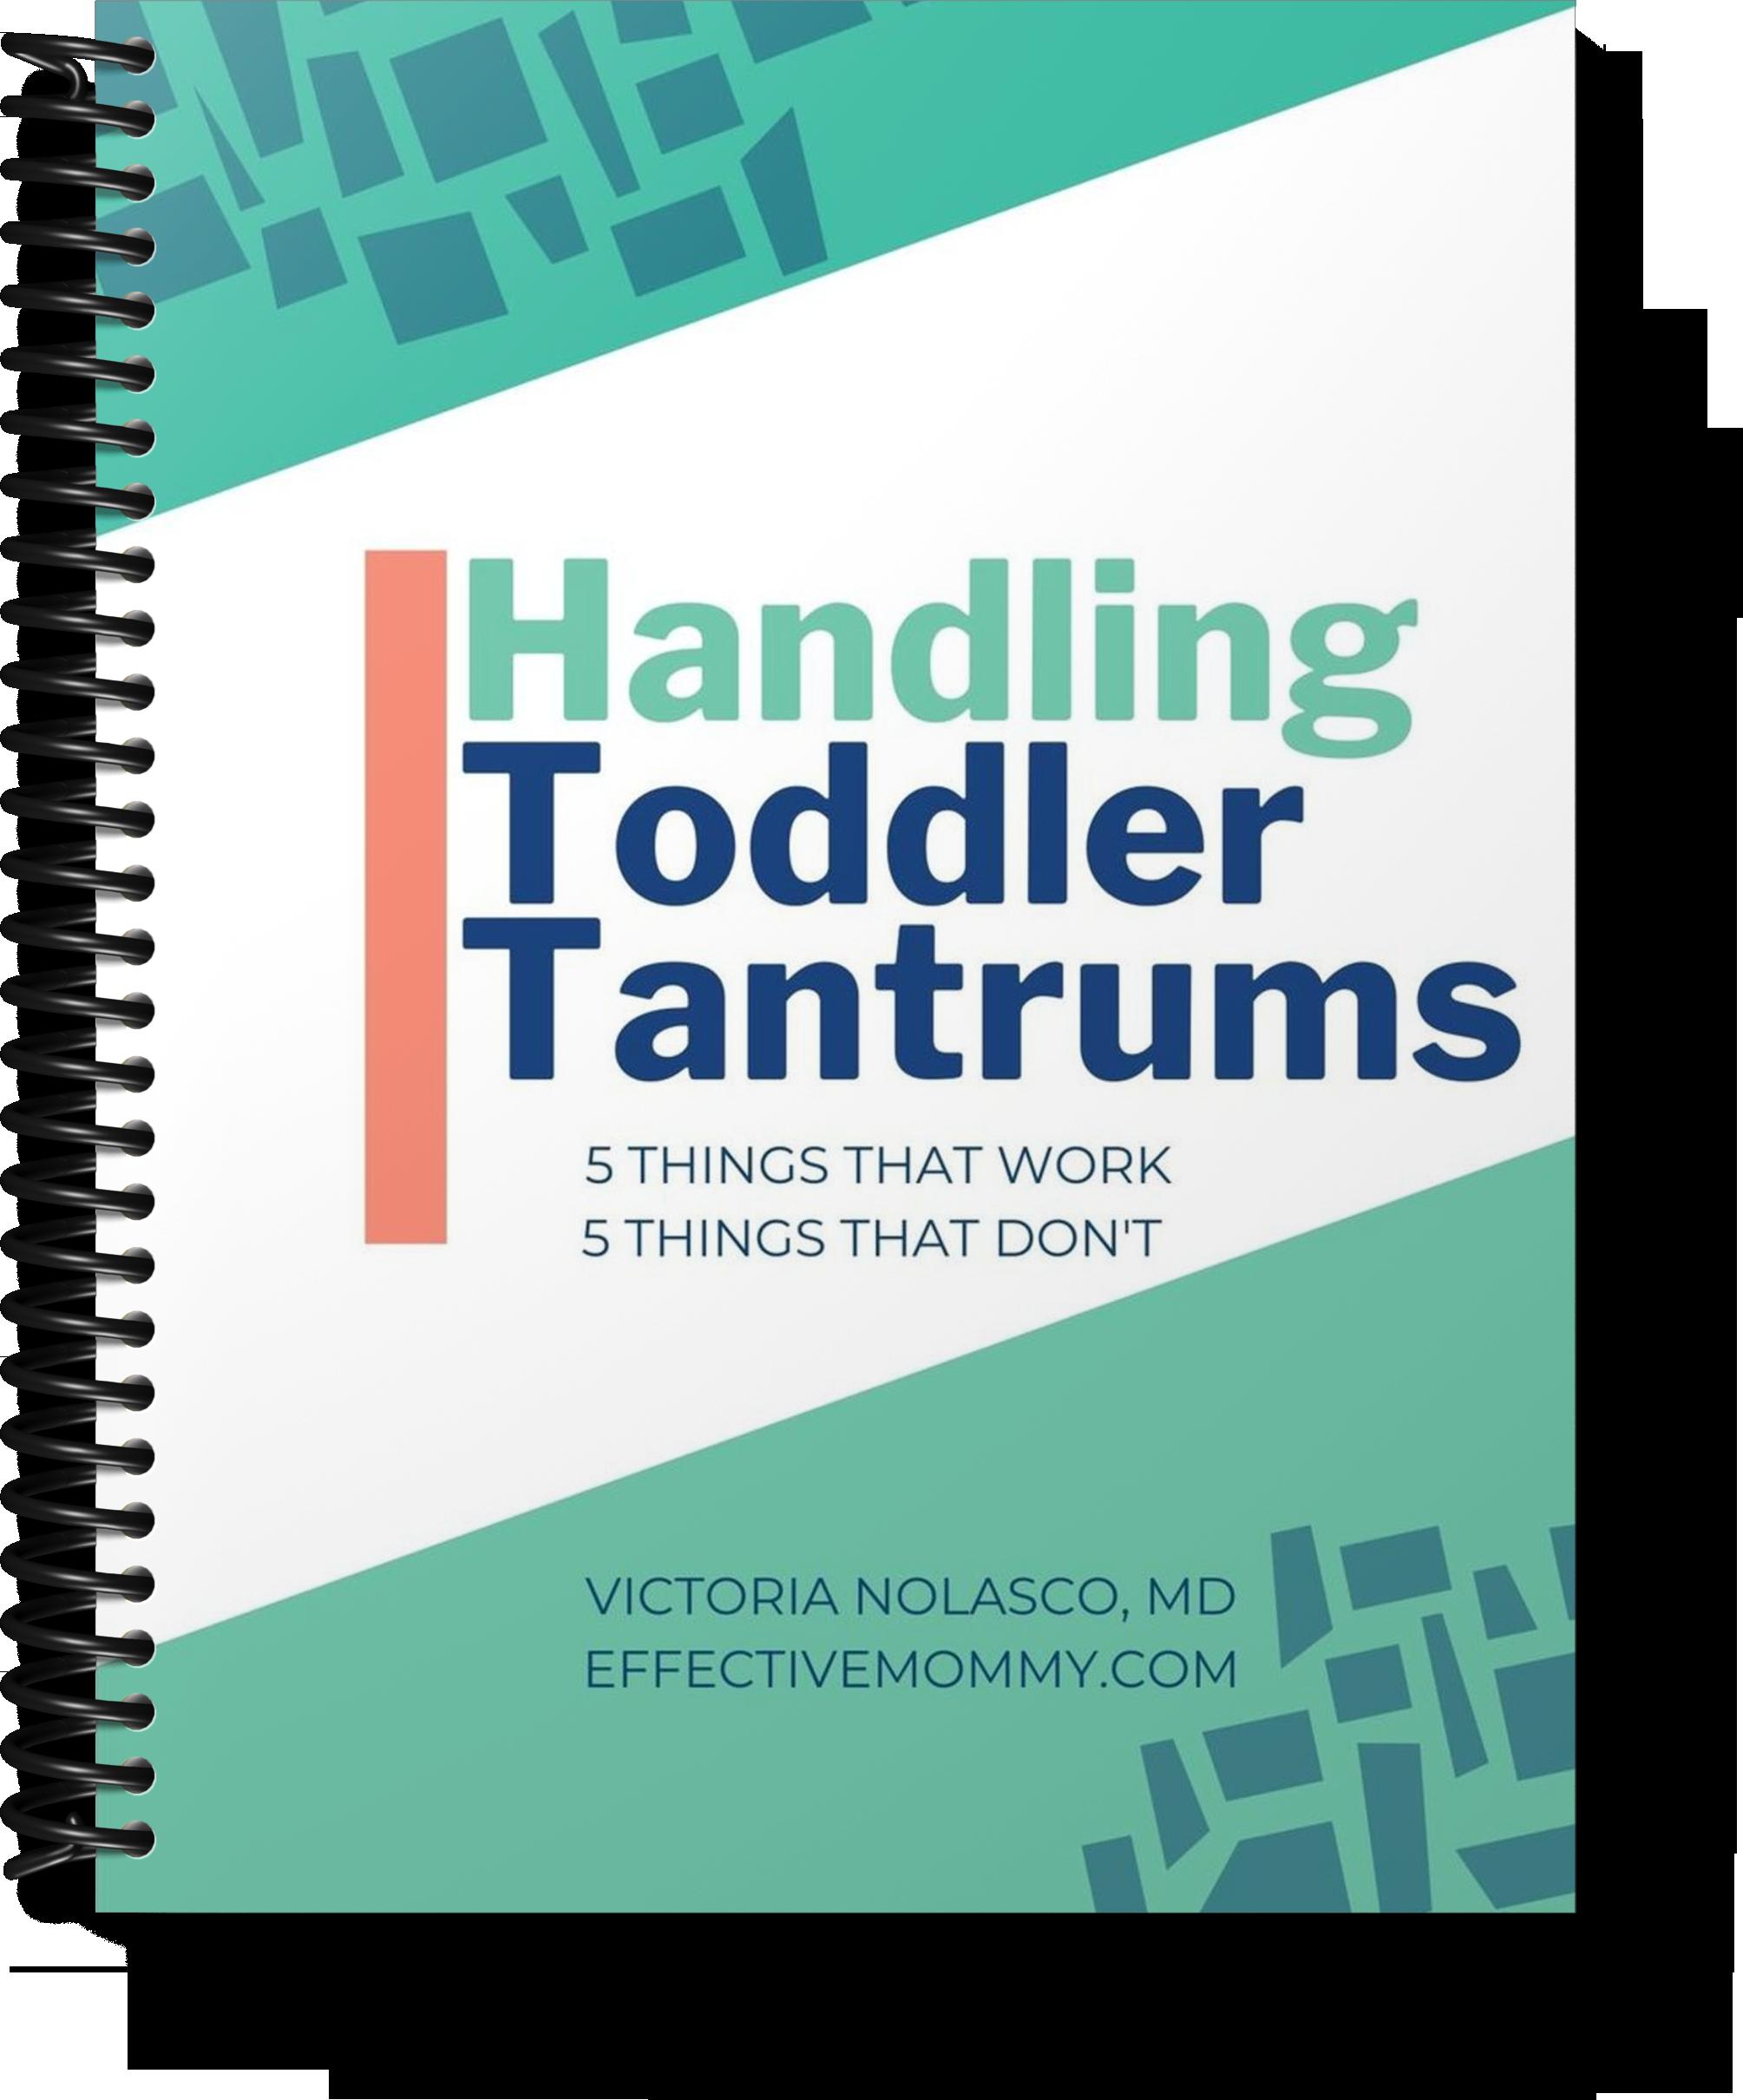 free checklist on handling toddler tantrums